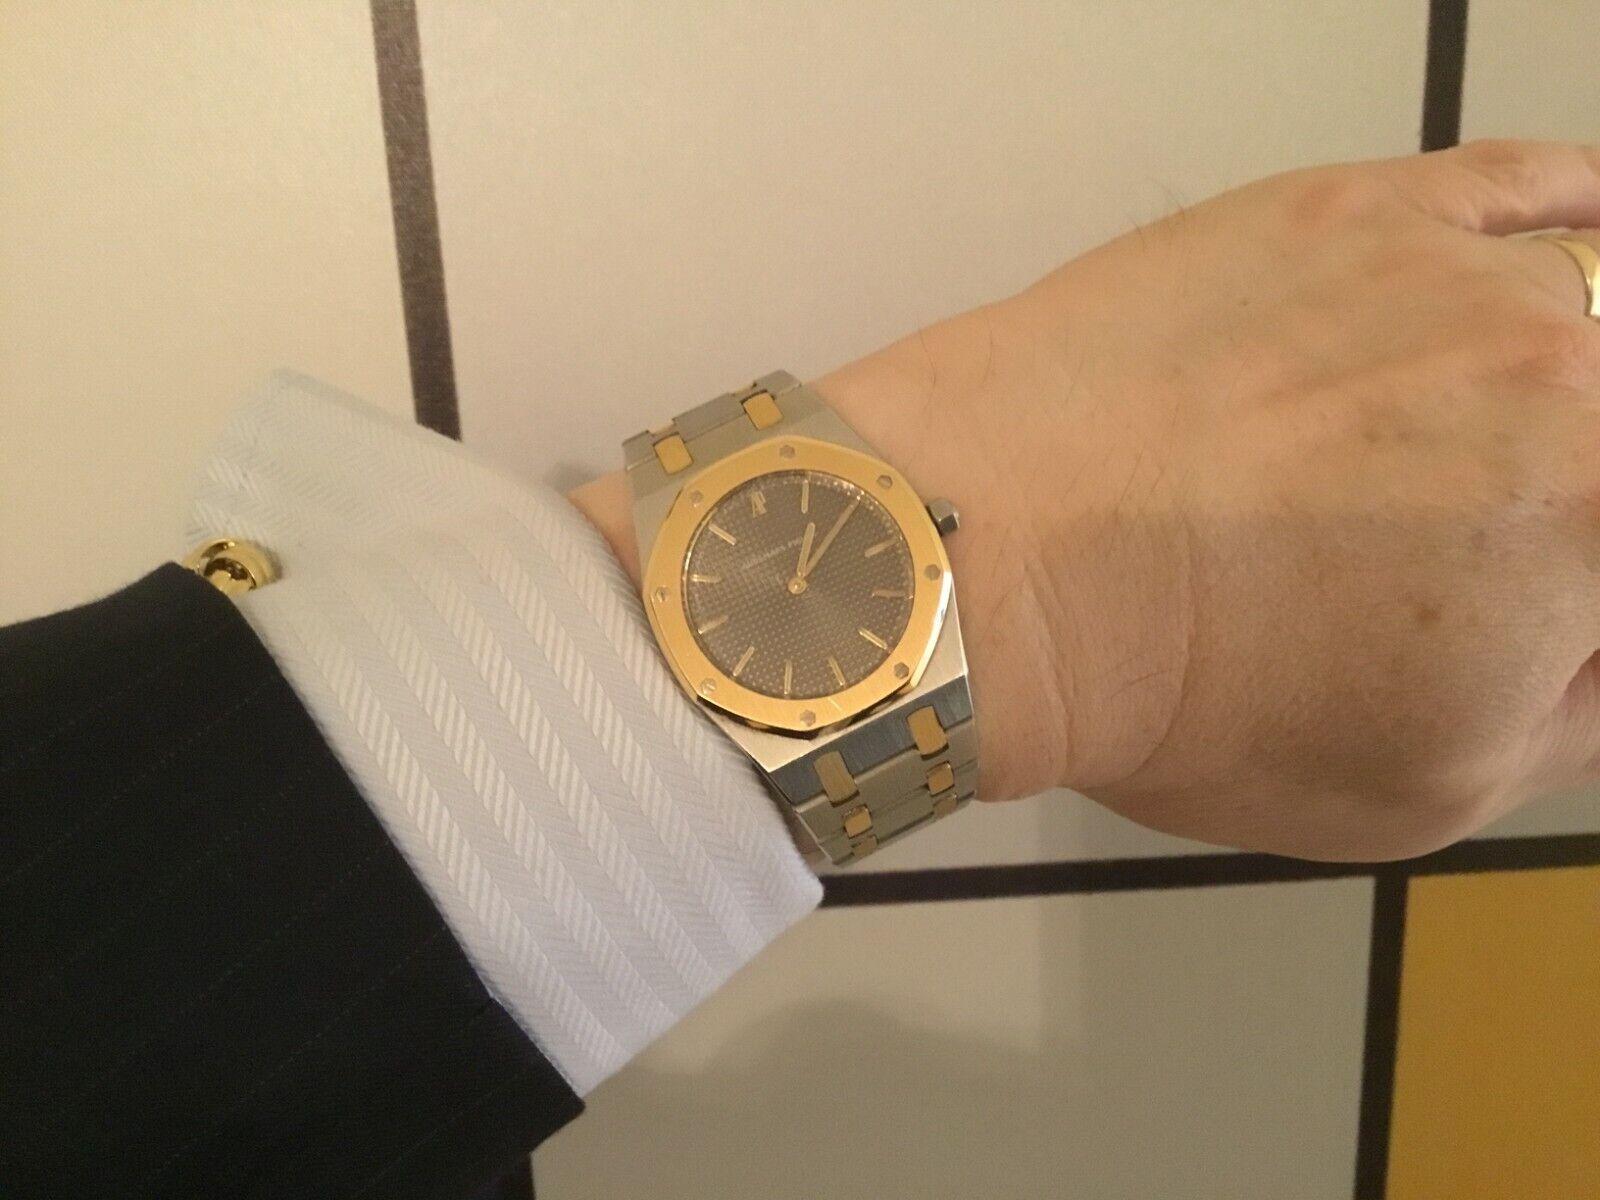 AUDEMARS PIGUET ROYAL OAK REF 56303SA TT STEEL 18K YELLOW GOLD WRISTWATCH W/BOX - watch picture 1